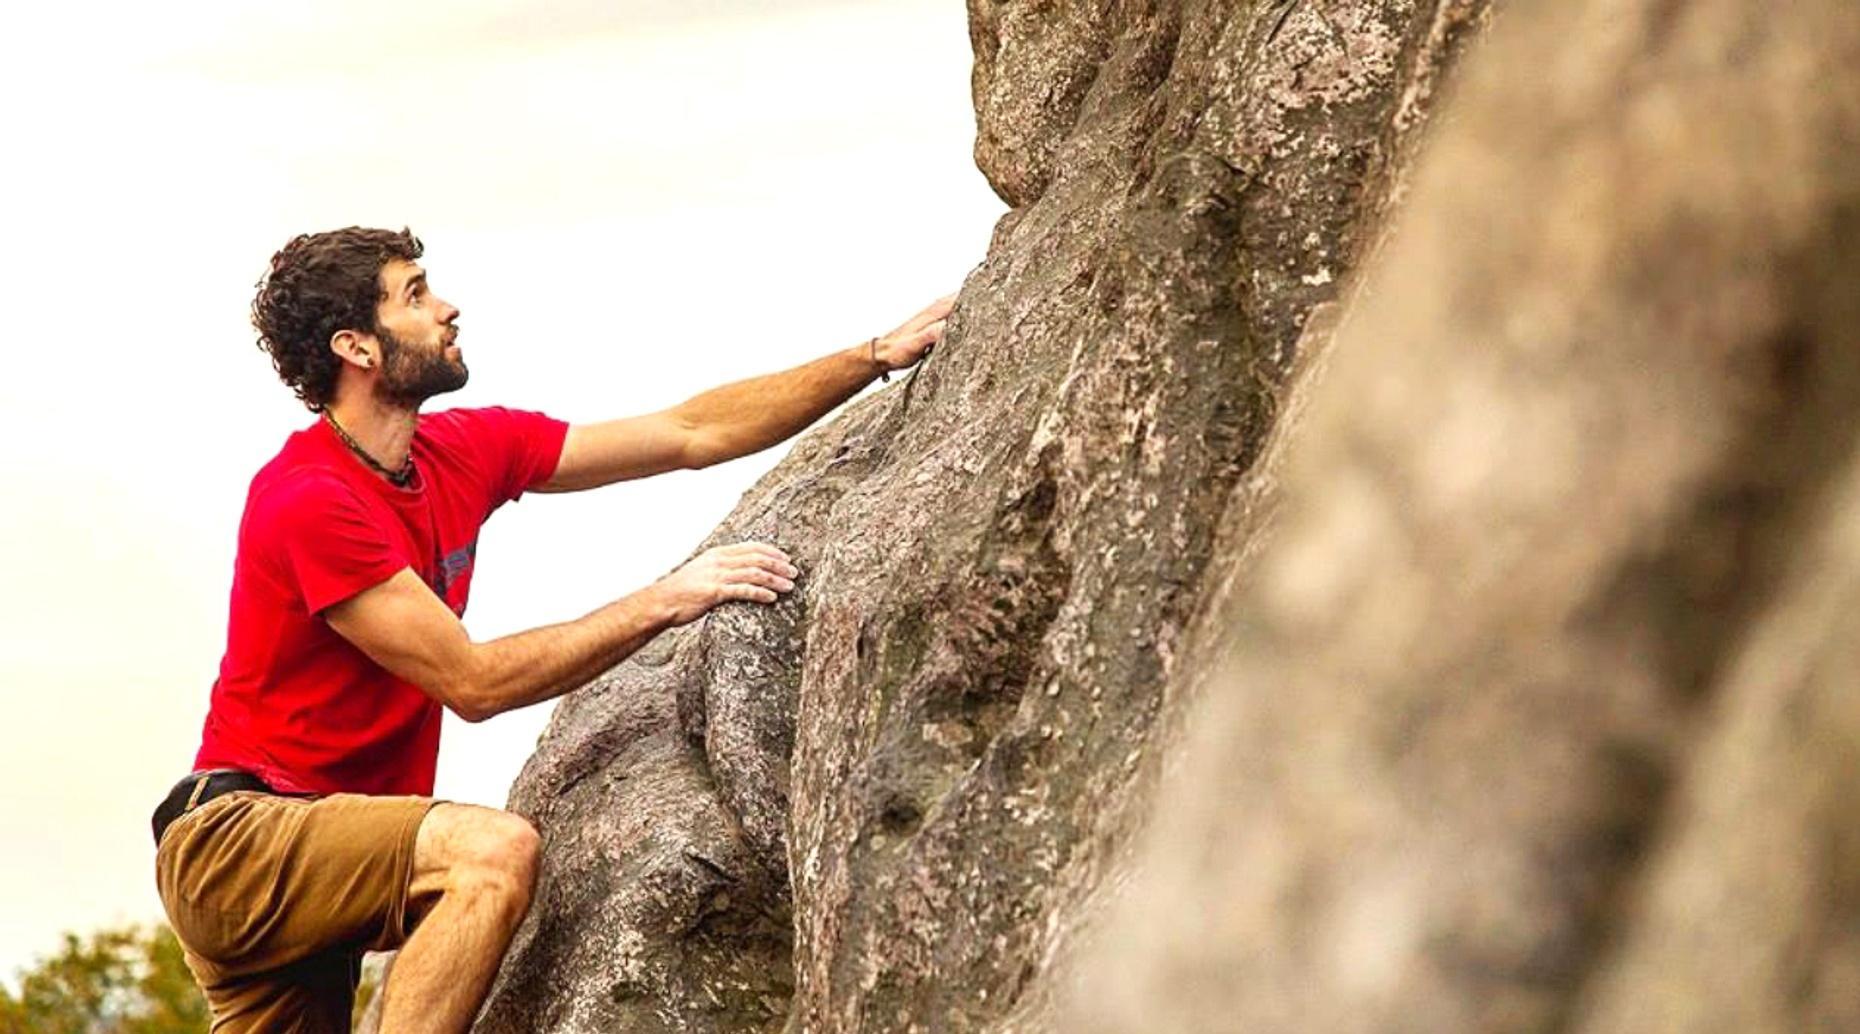 Full-Day Basic Rock Climbing Class in Calabasas